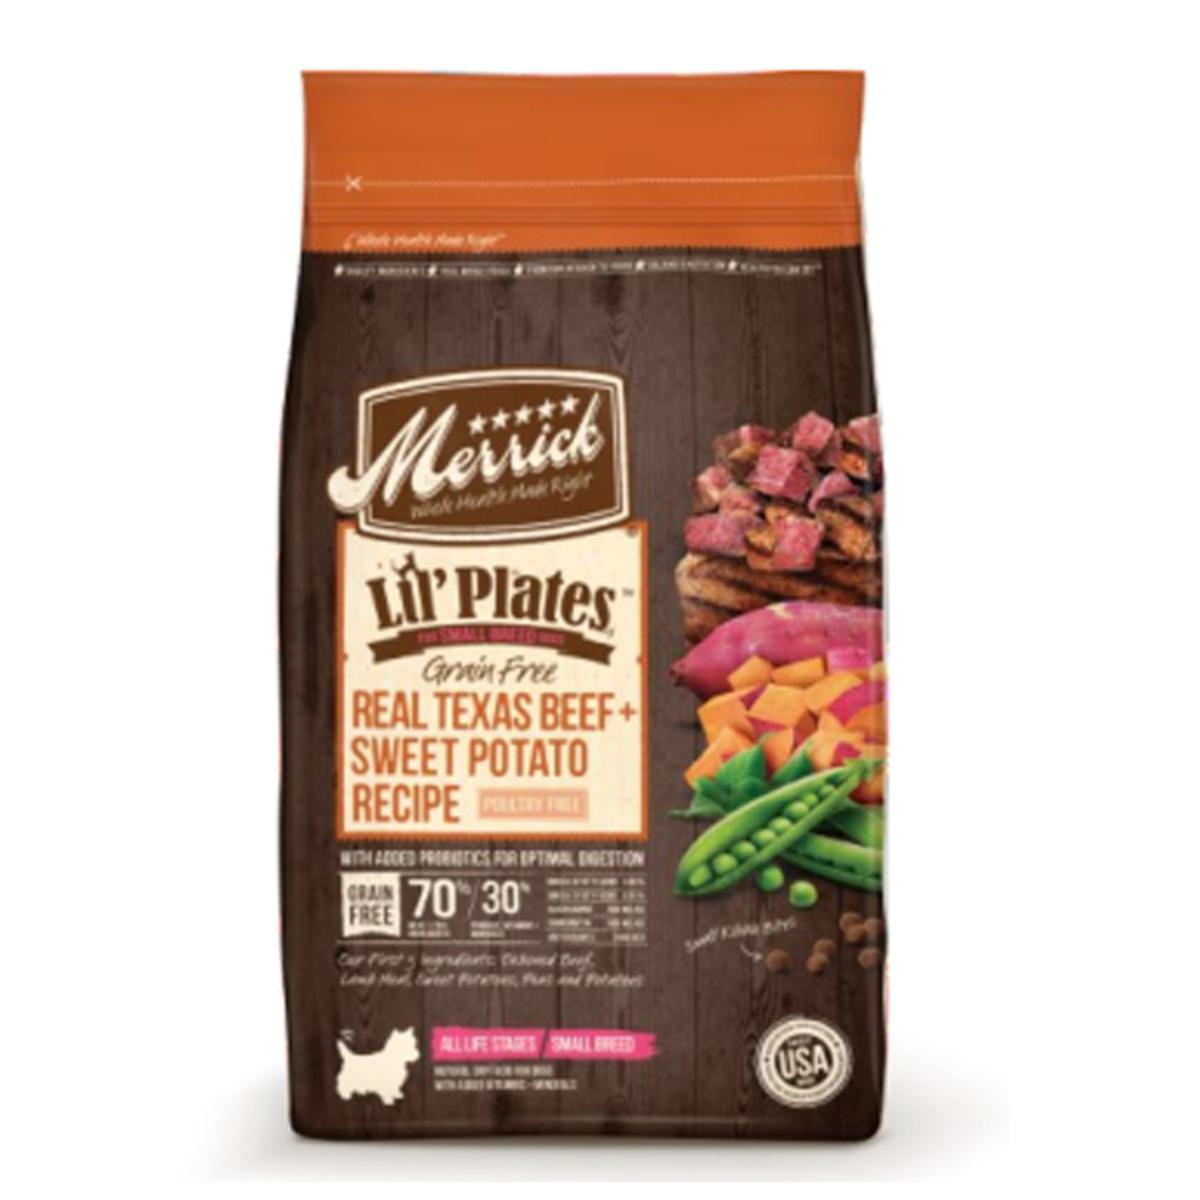 Lil'Plates Grain Free Real Texas Beef + Sweet Potato Recipe - 4lb